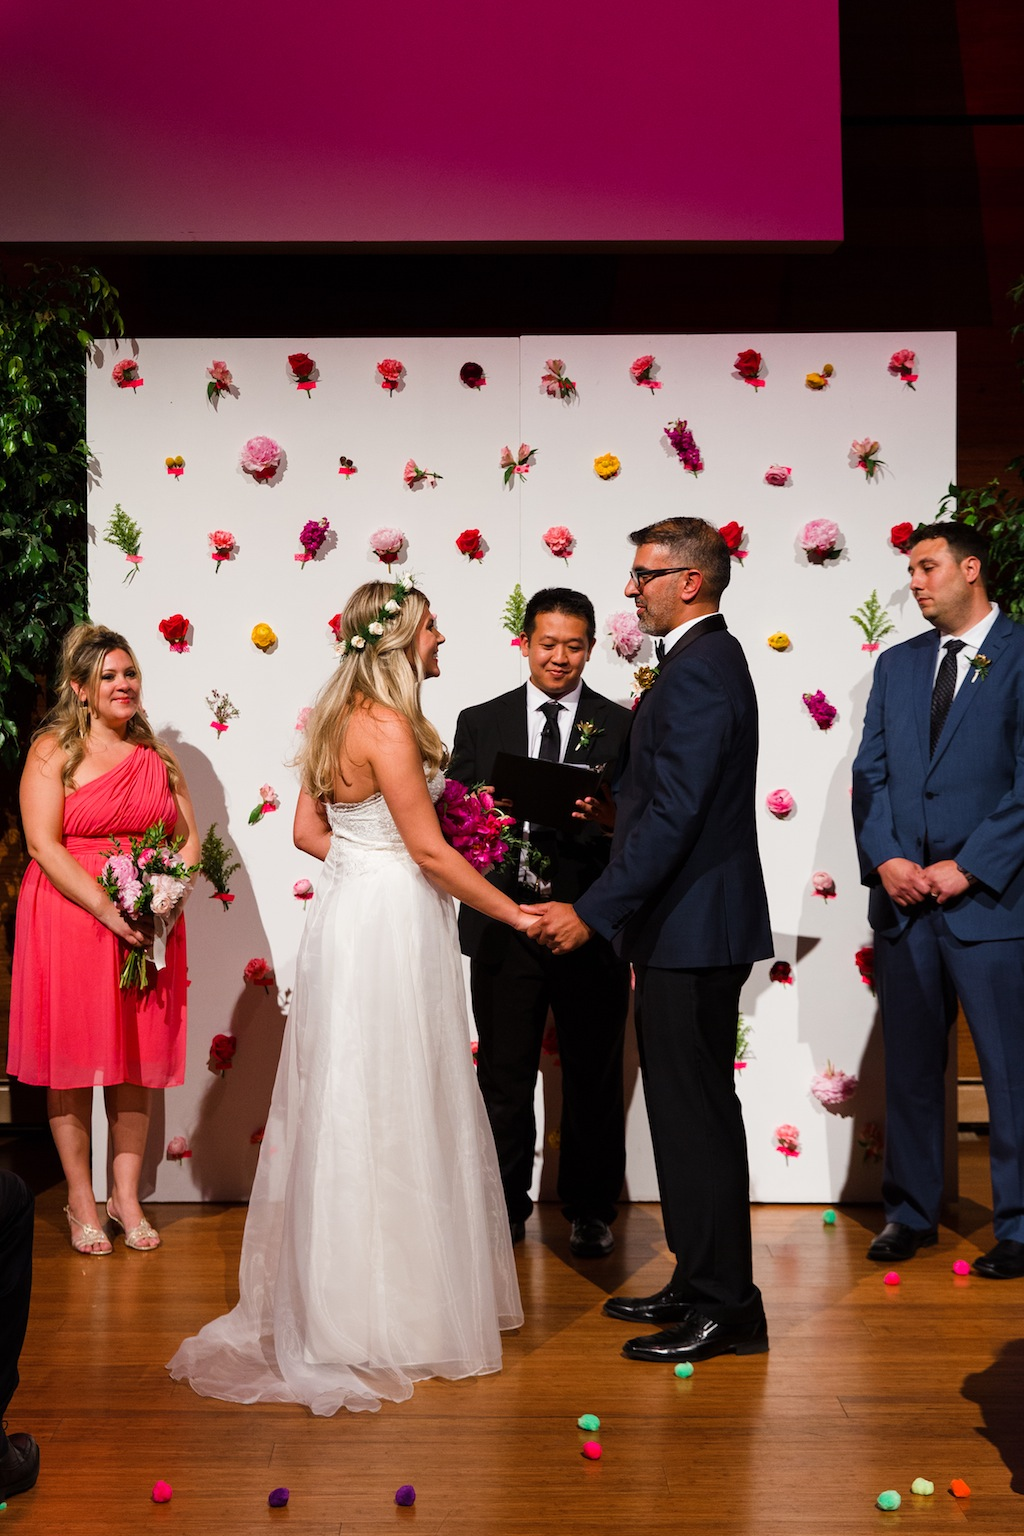 1-19-16-fuchsia-modern-wedding-artisphere-8